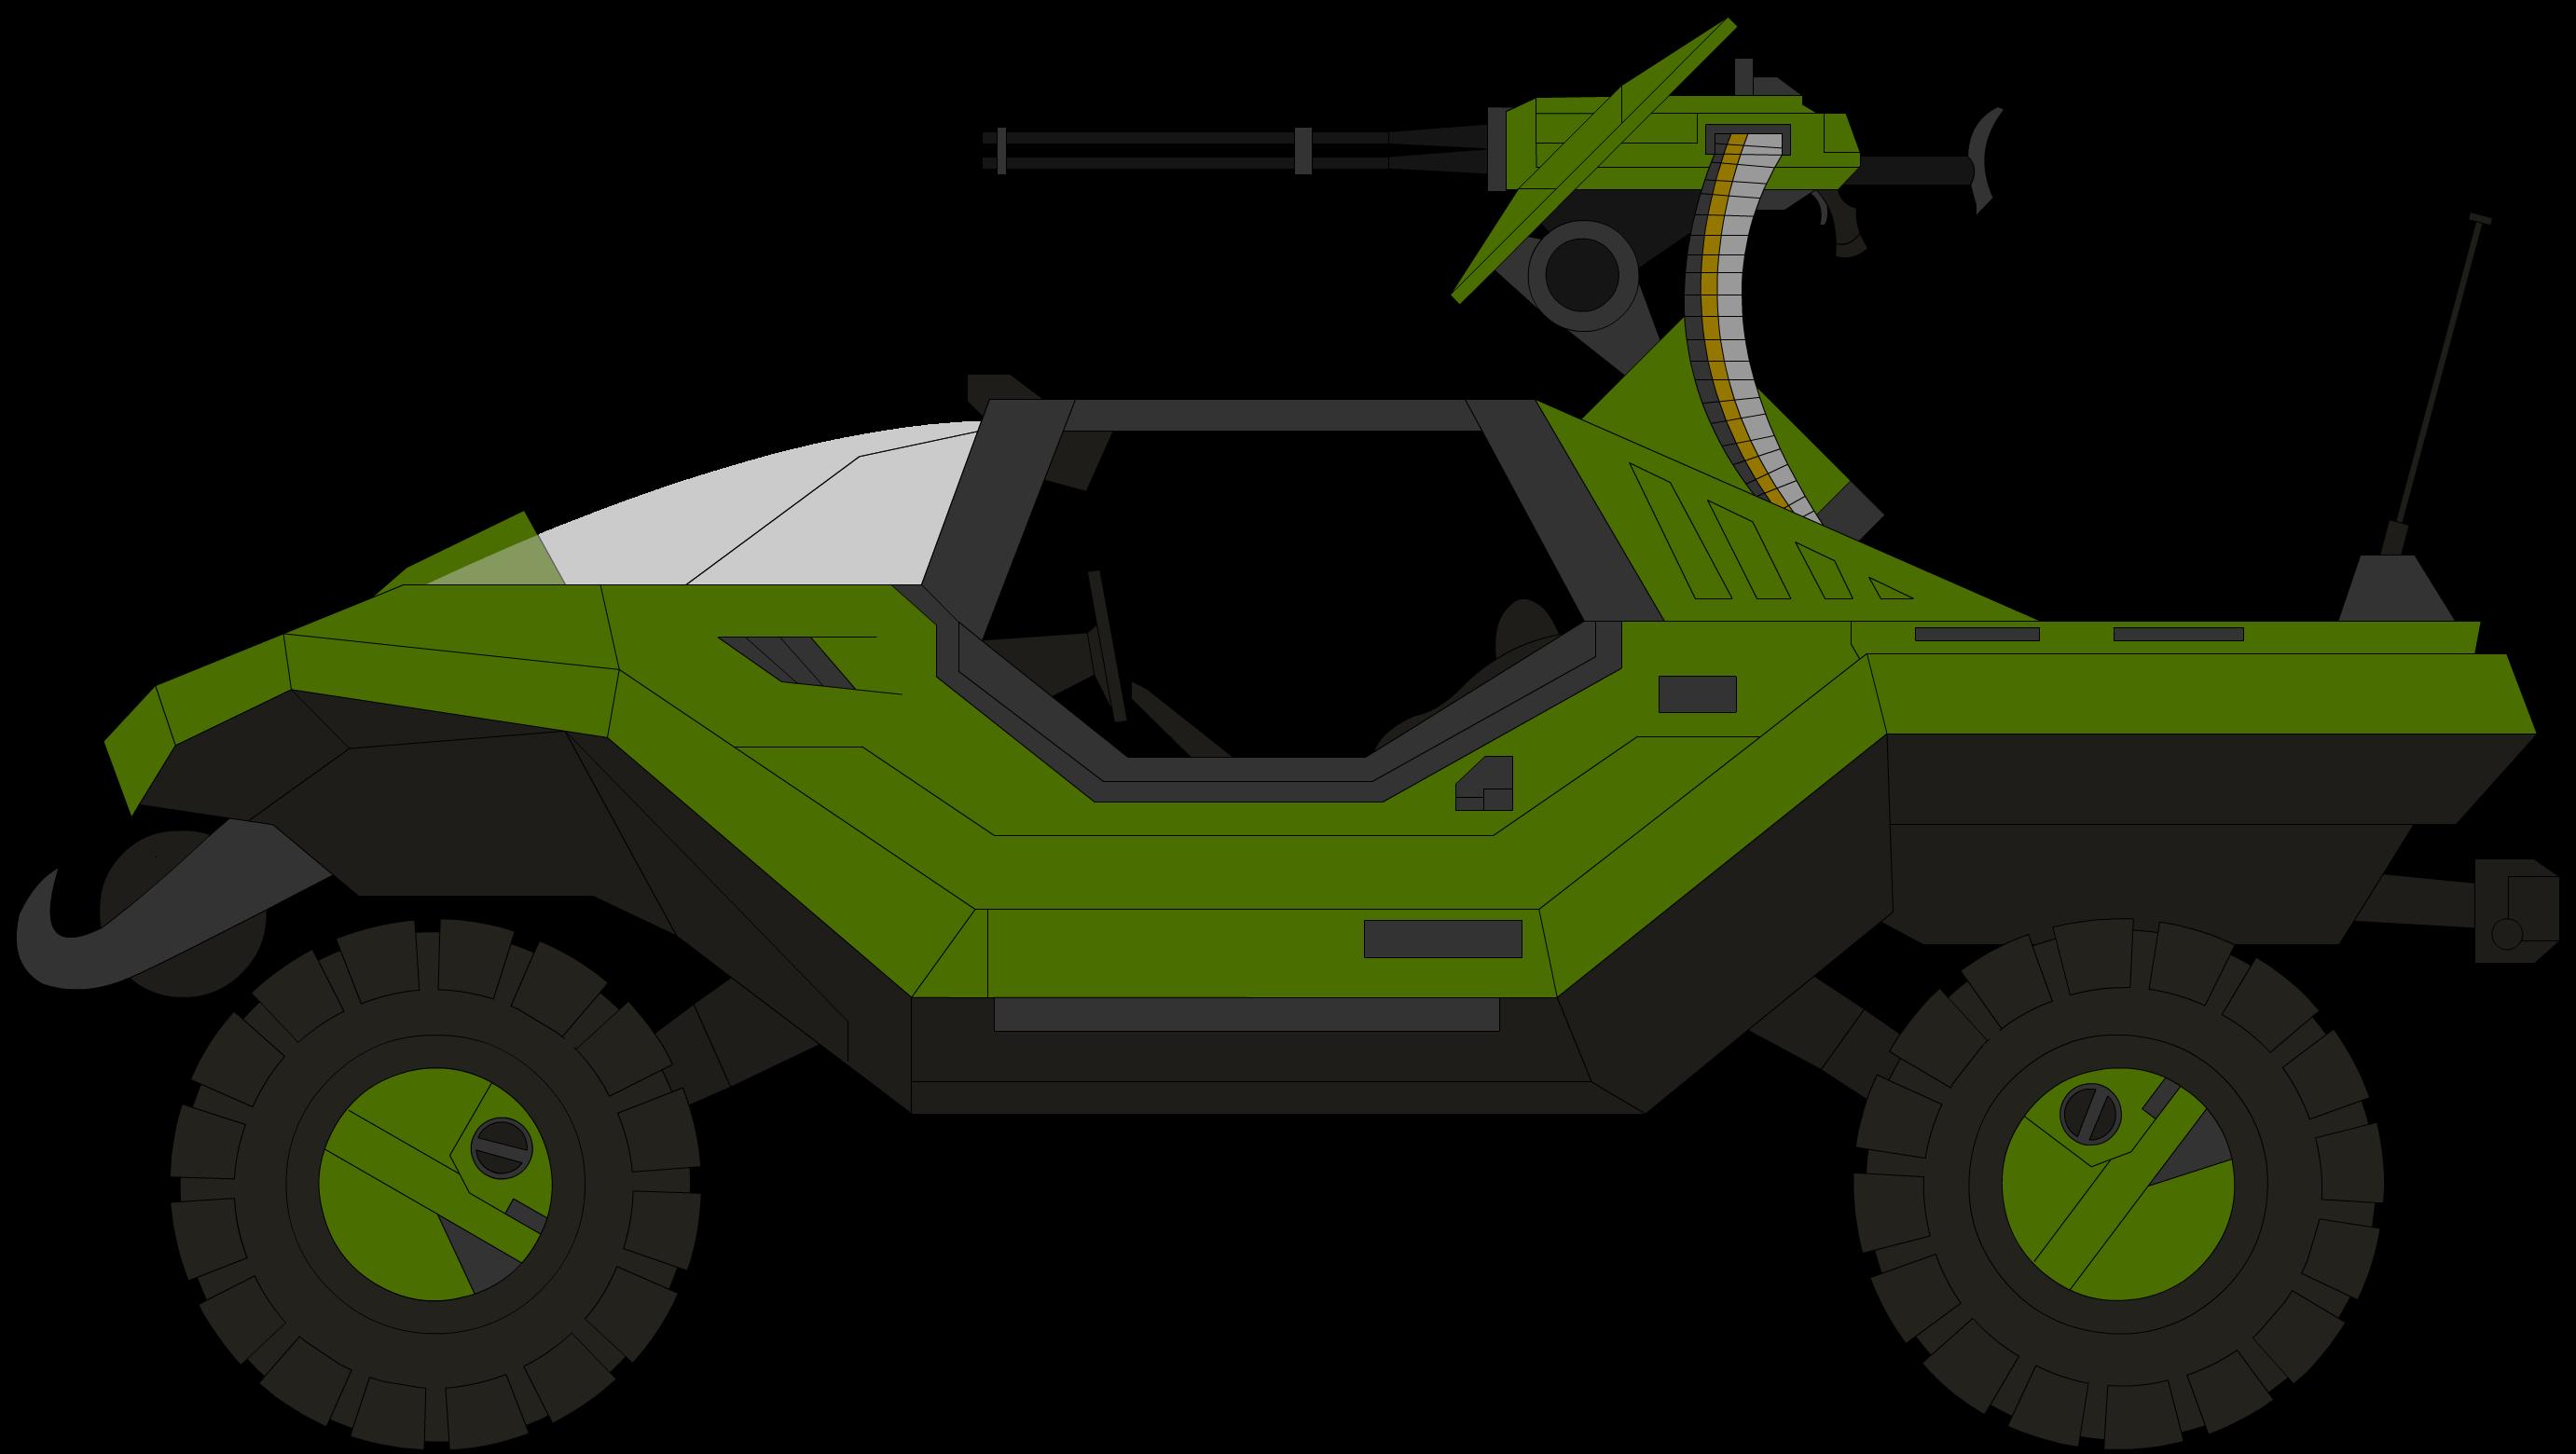 M12B4 Warthog Knight Force Application Vehicle